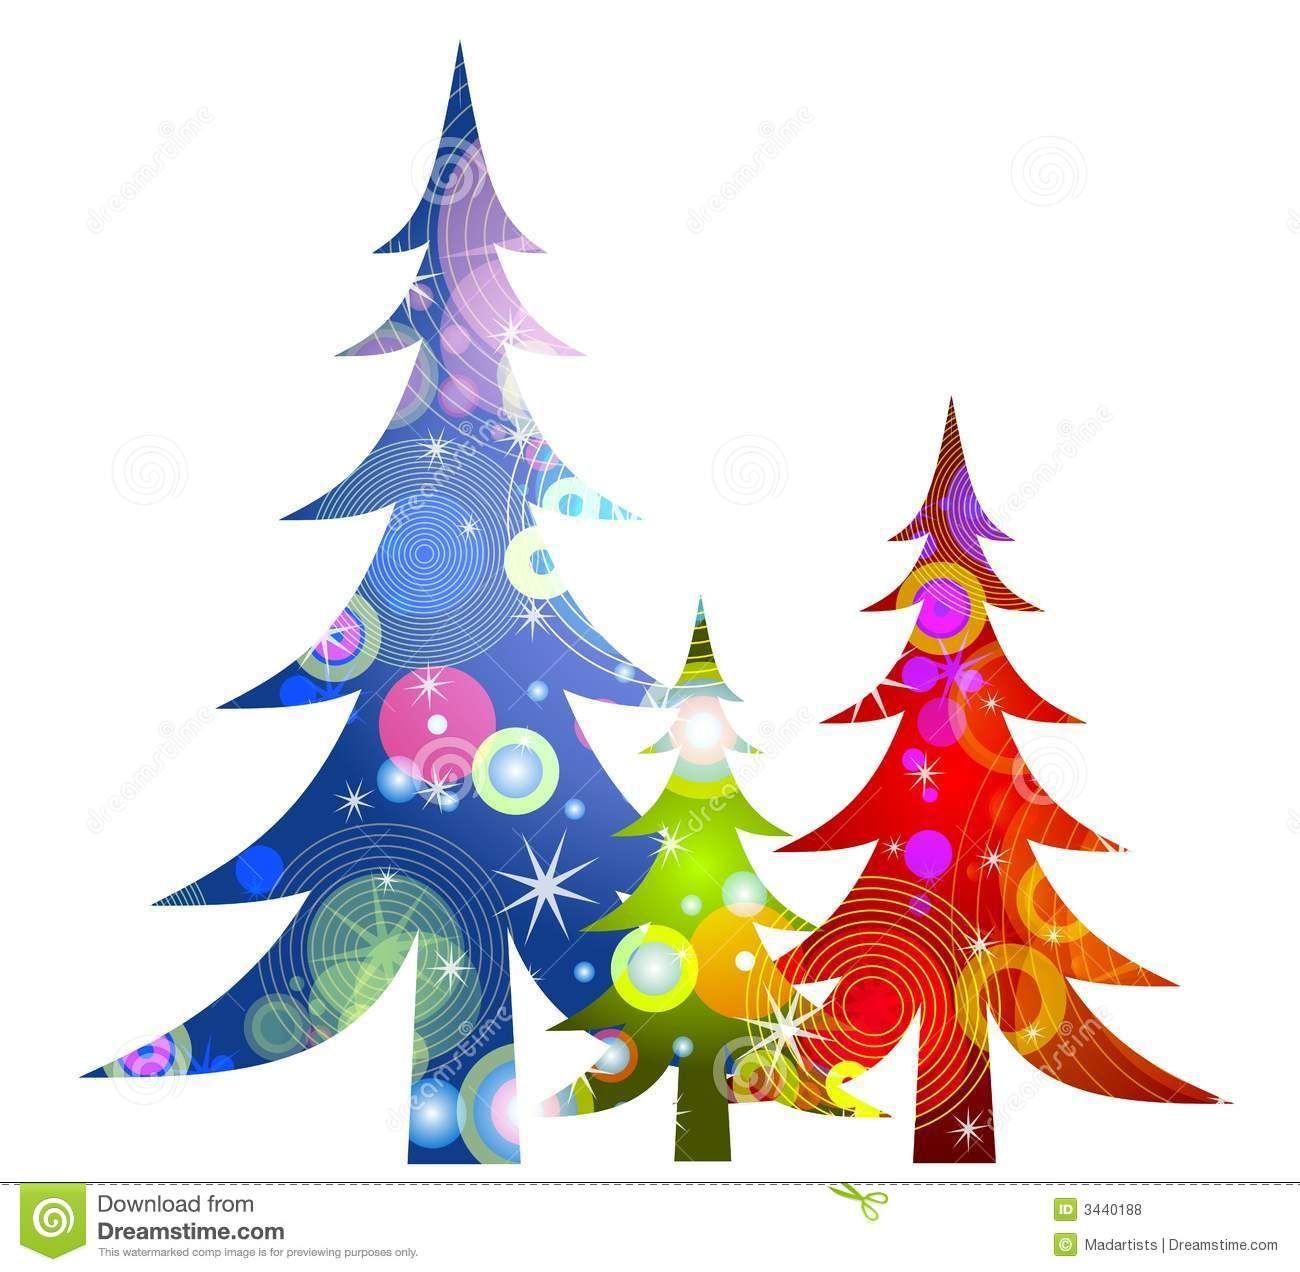 1300x1272 Retro Christmas Trees Clip Art Royalty Free Stock Photos